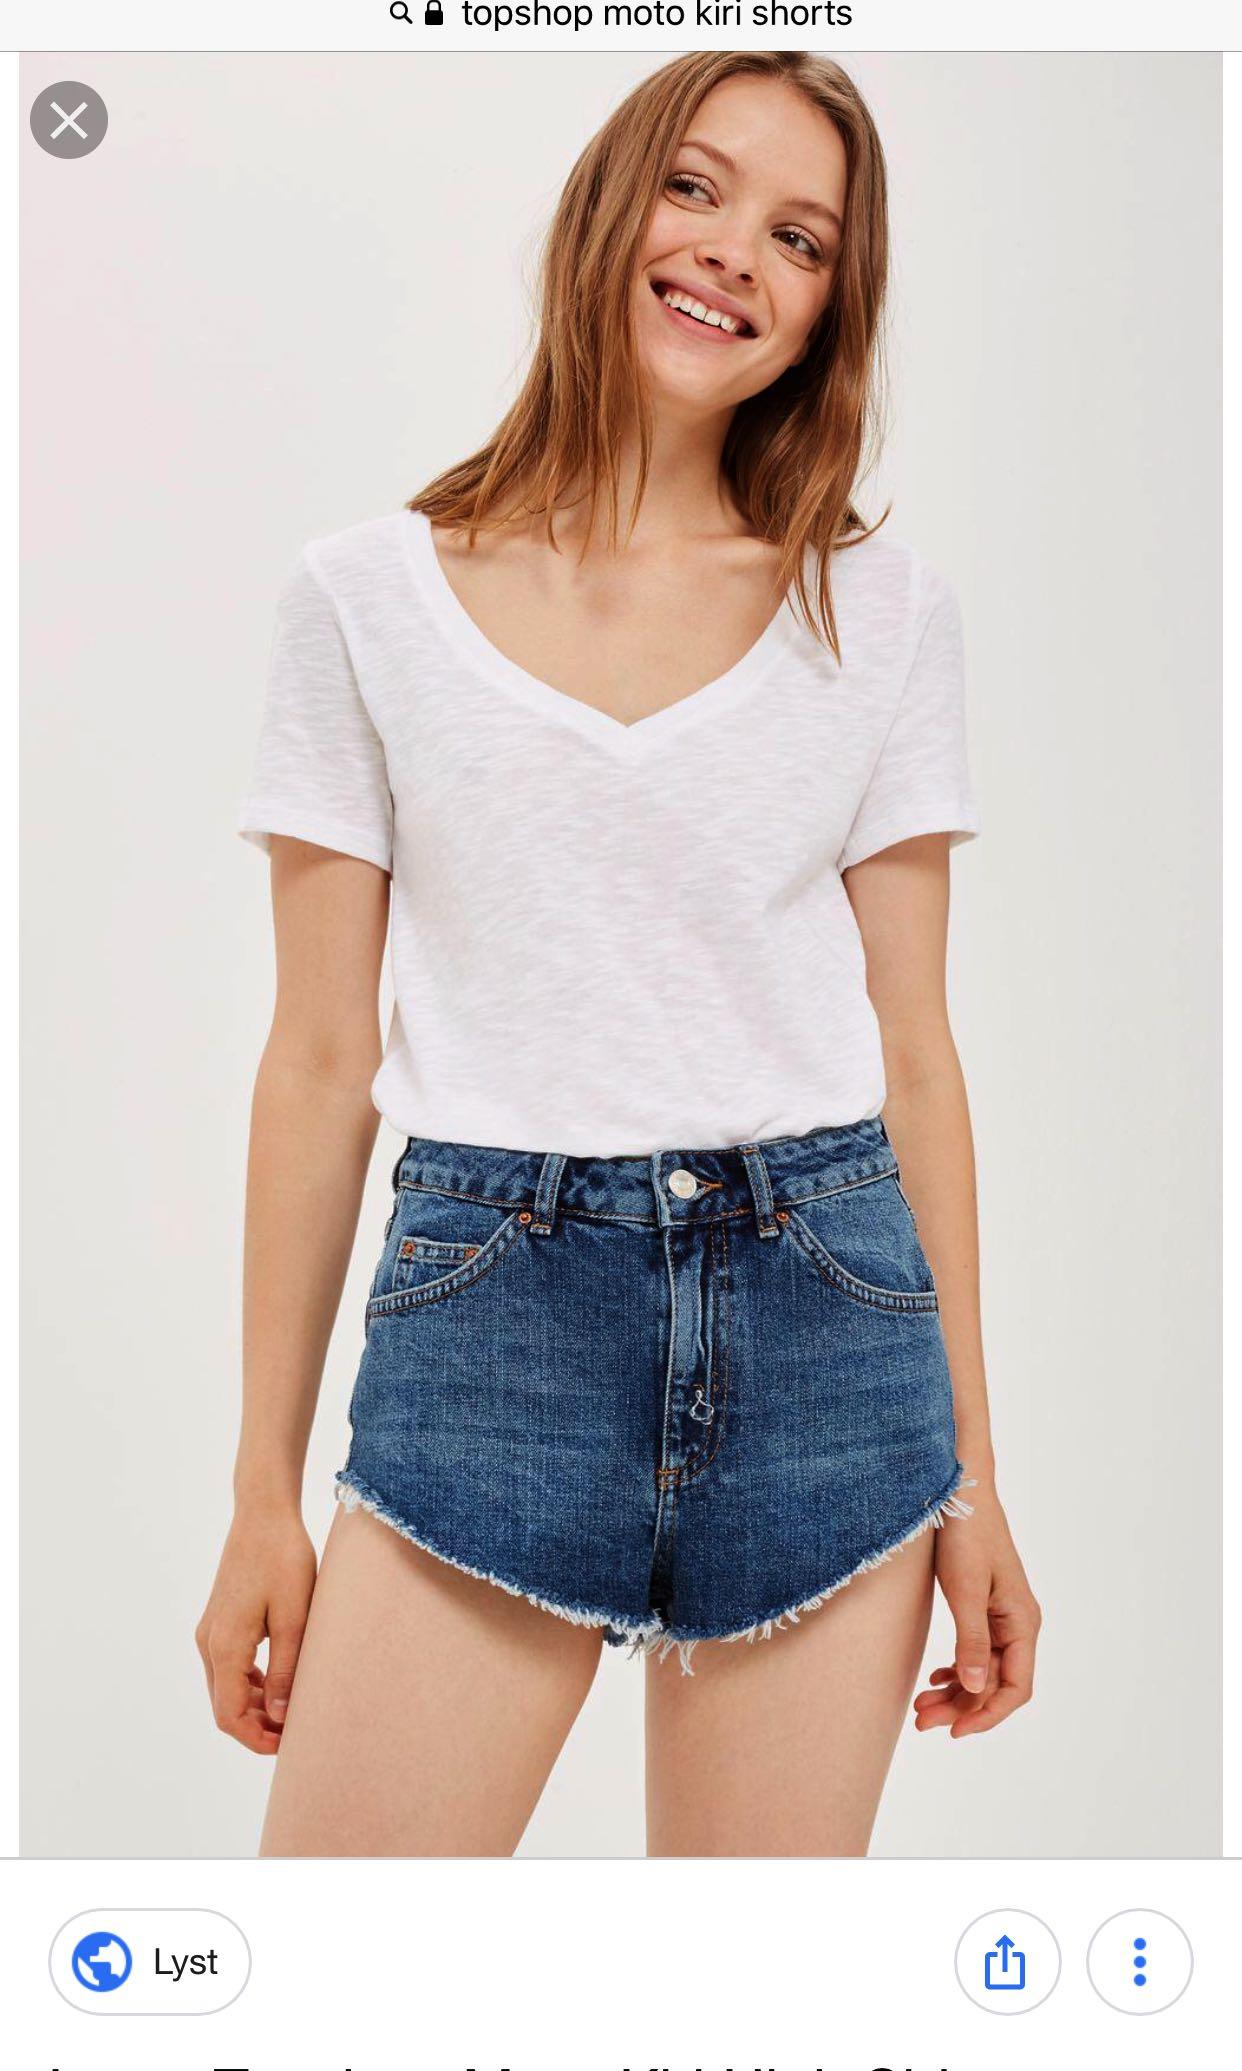 052007414 TOPSHOP MOTO Kiri Shorts, Women's Fashion, Clothes, Pants, Jeans ...